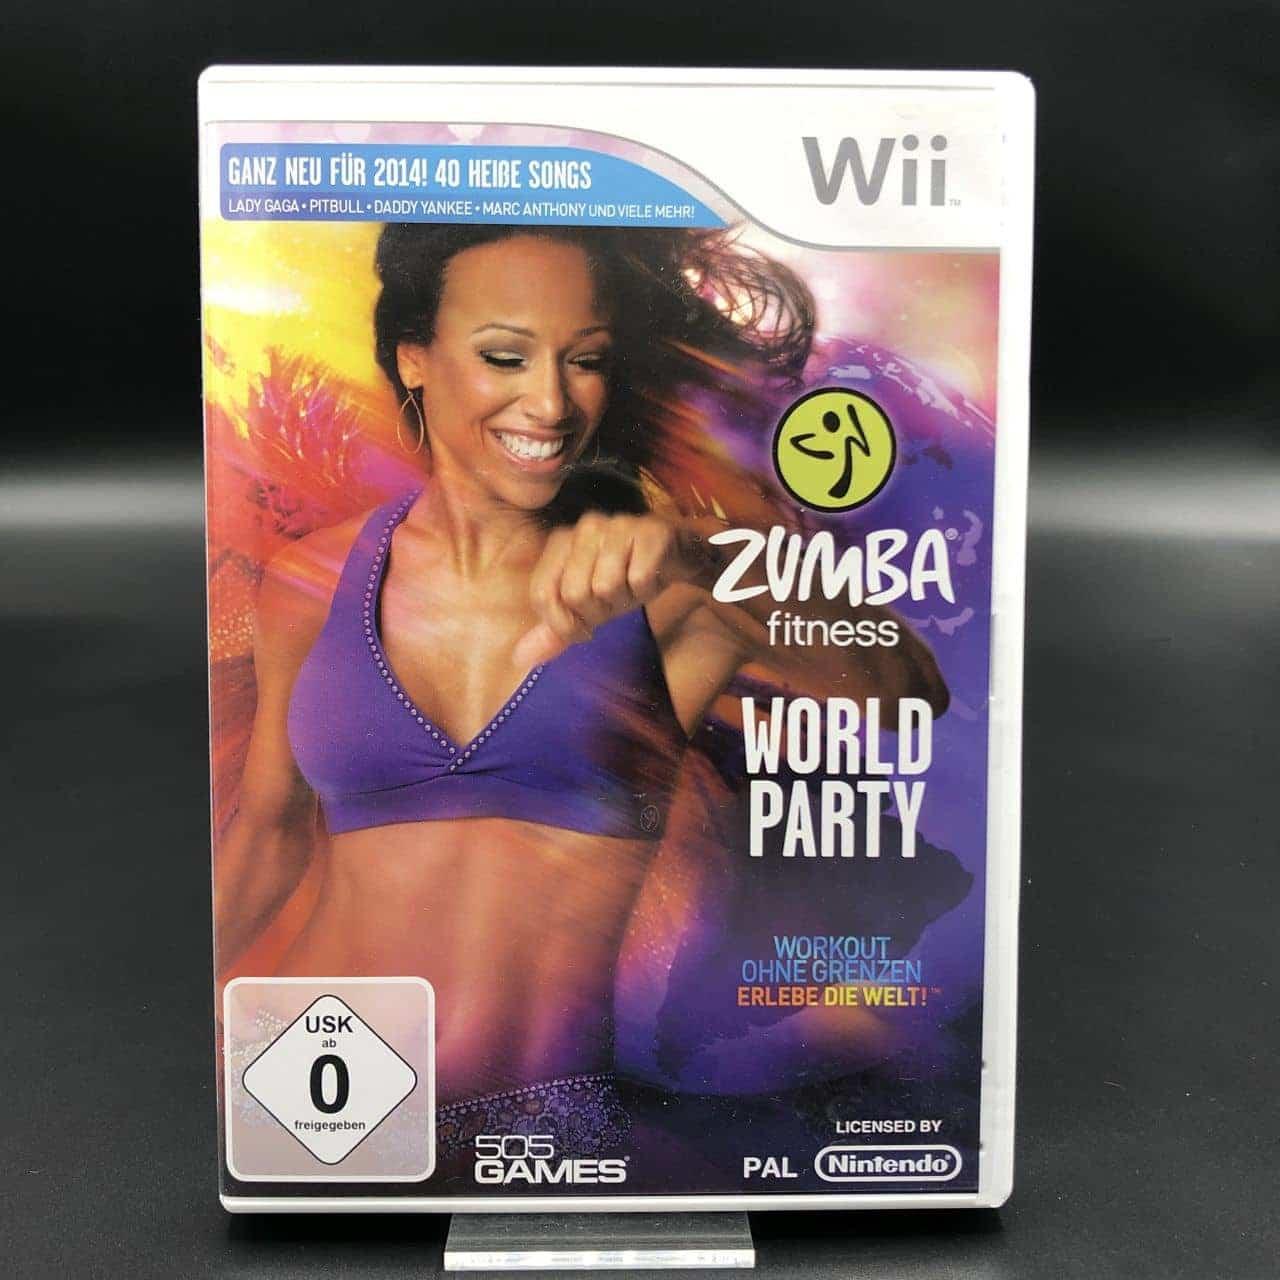 Zumba Fitness: World Party (Komplett) (Sehr gut) Nintendo Wii